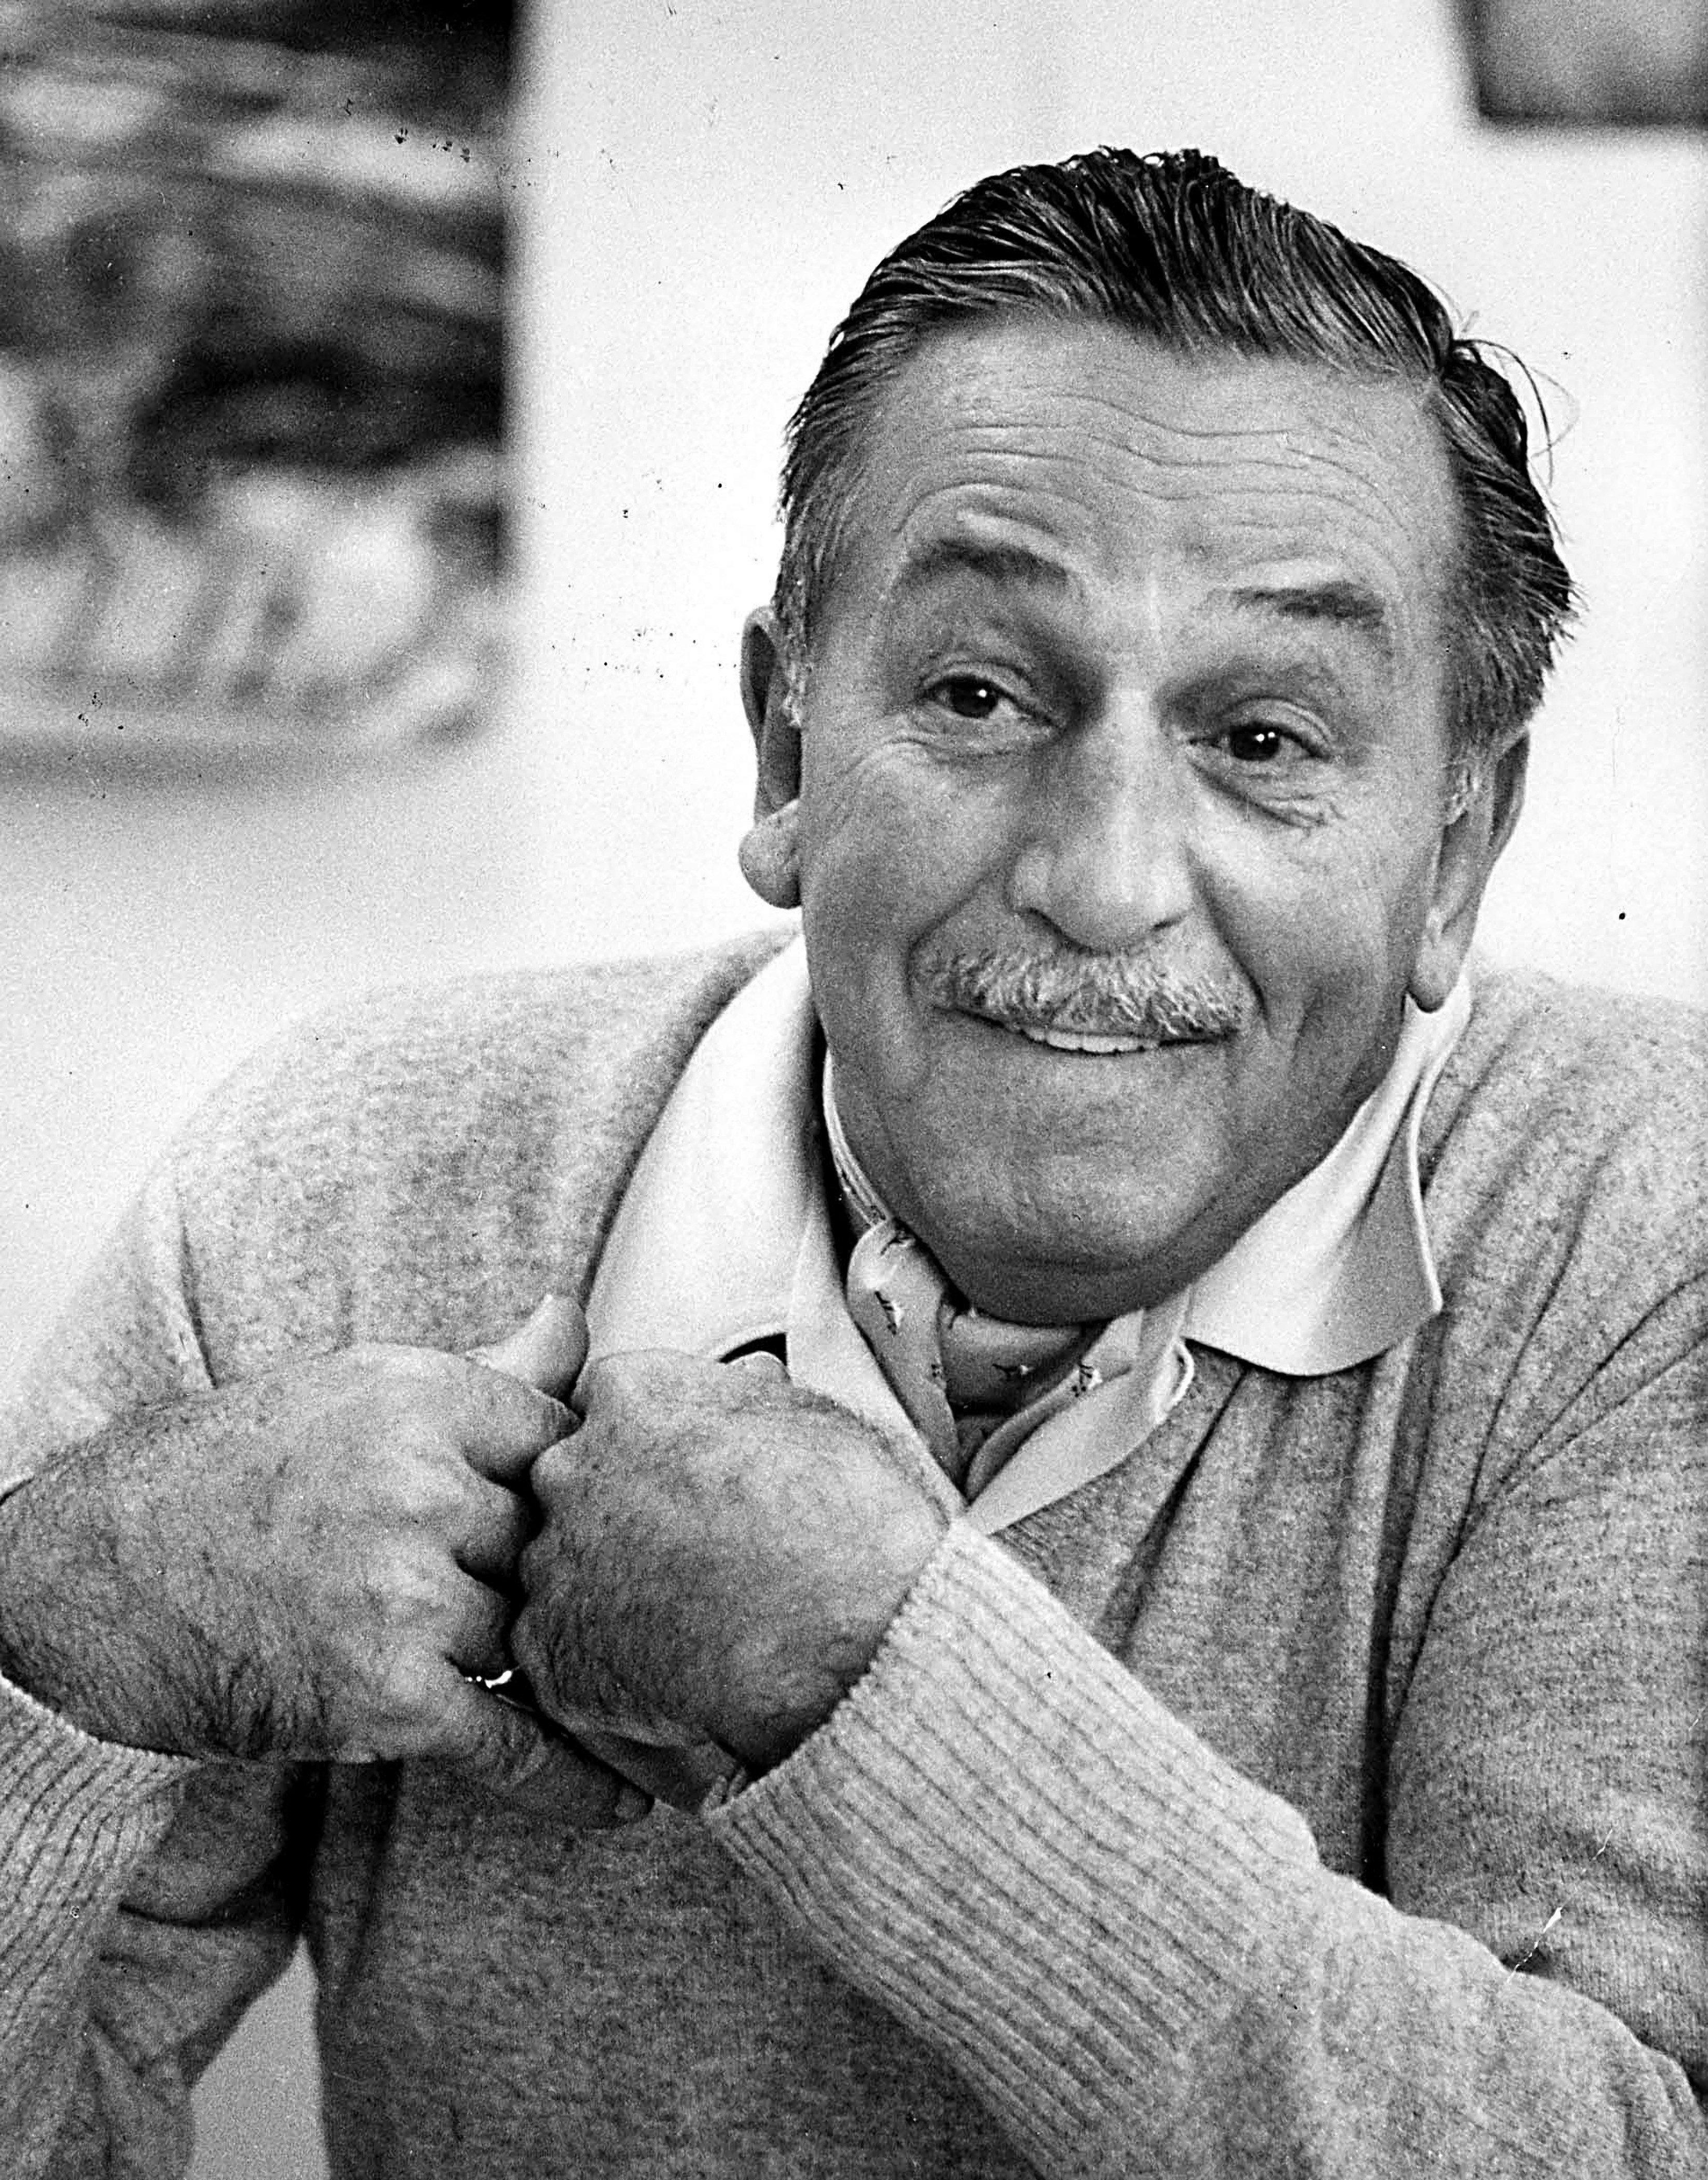 Mandatory Credit: Photo by Mediapunch/Shutterstock (10497503a) 2/1960 Walt Disney Walt Disney 1960